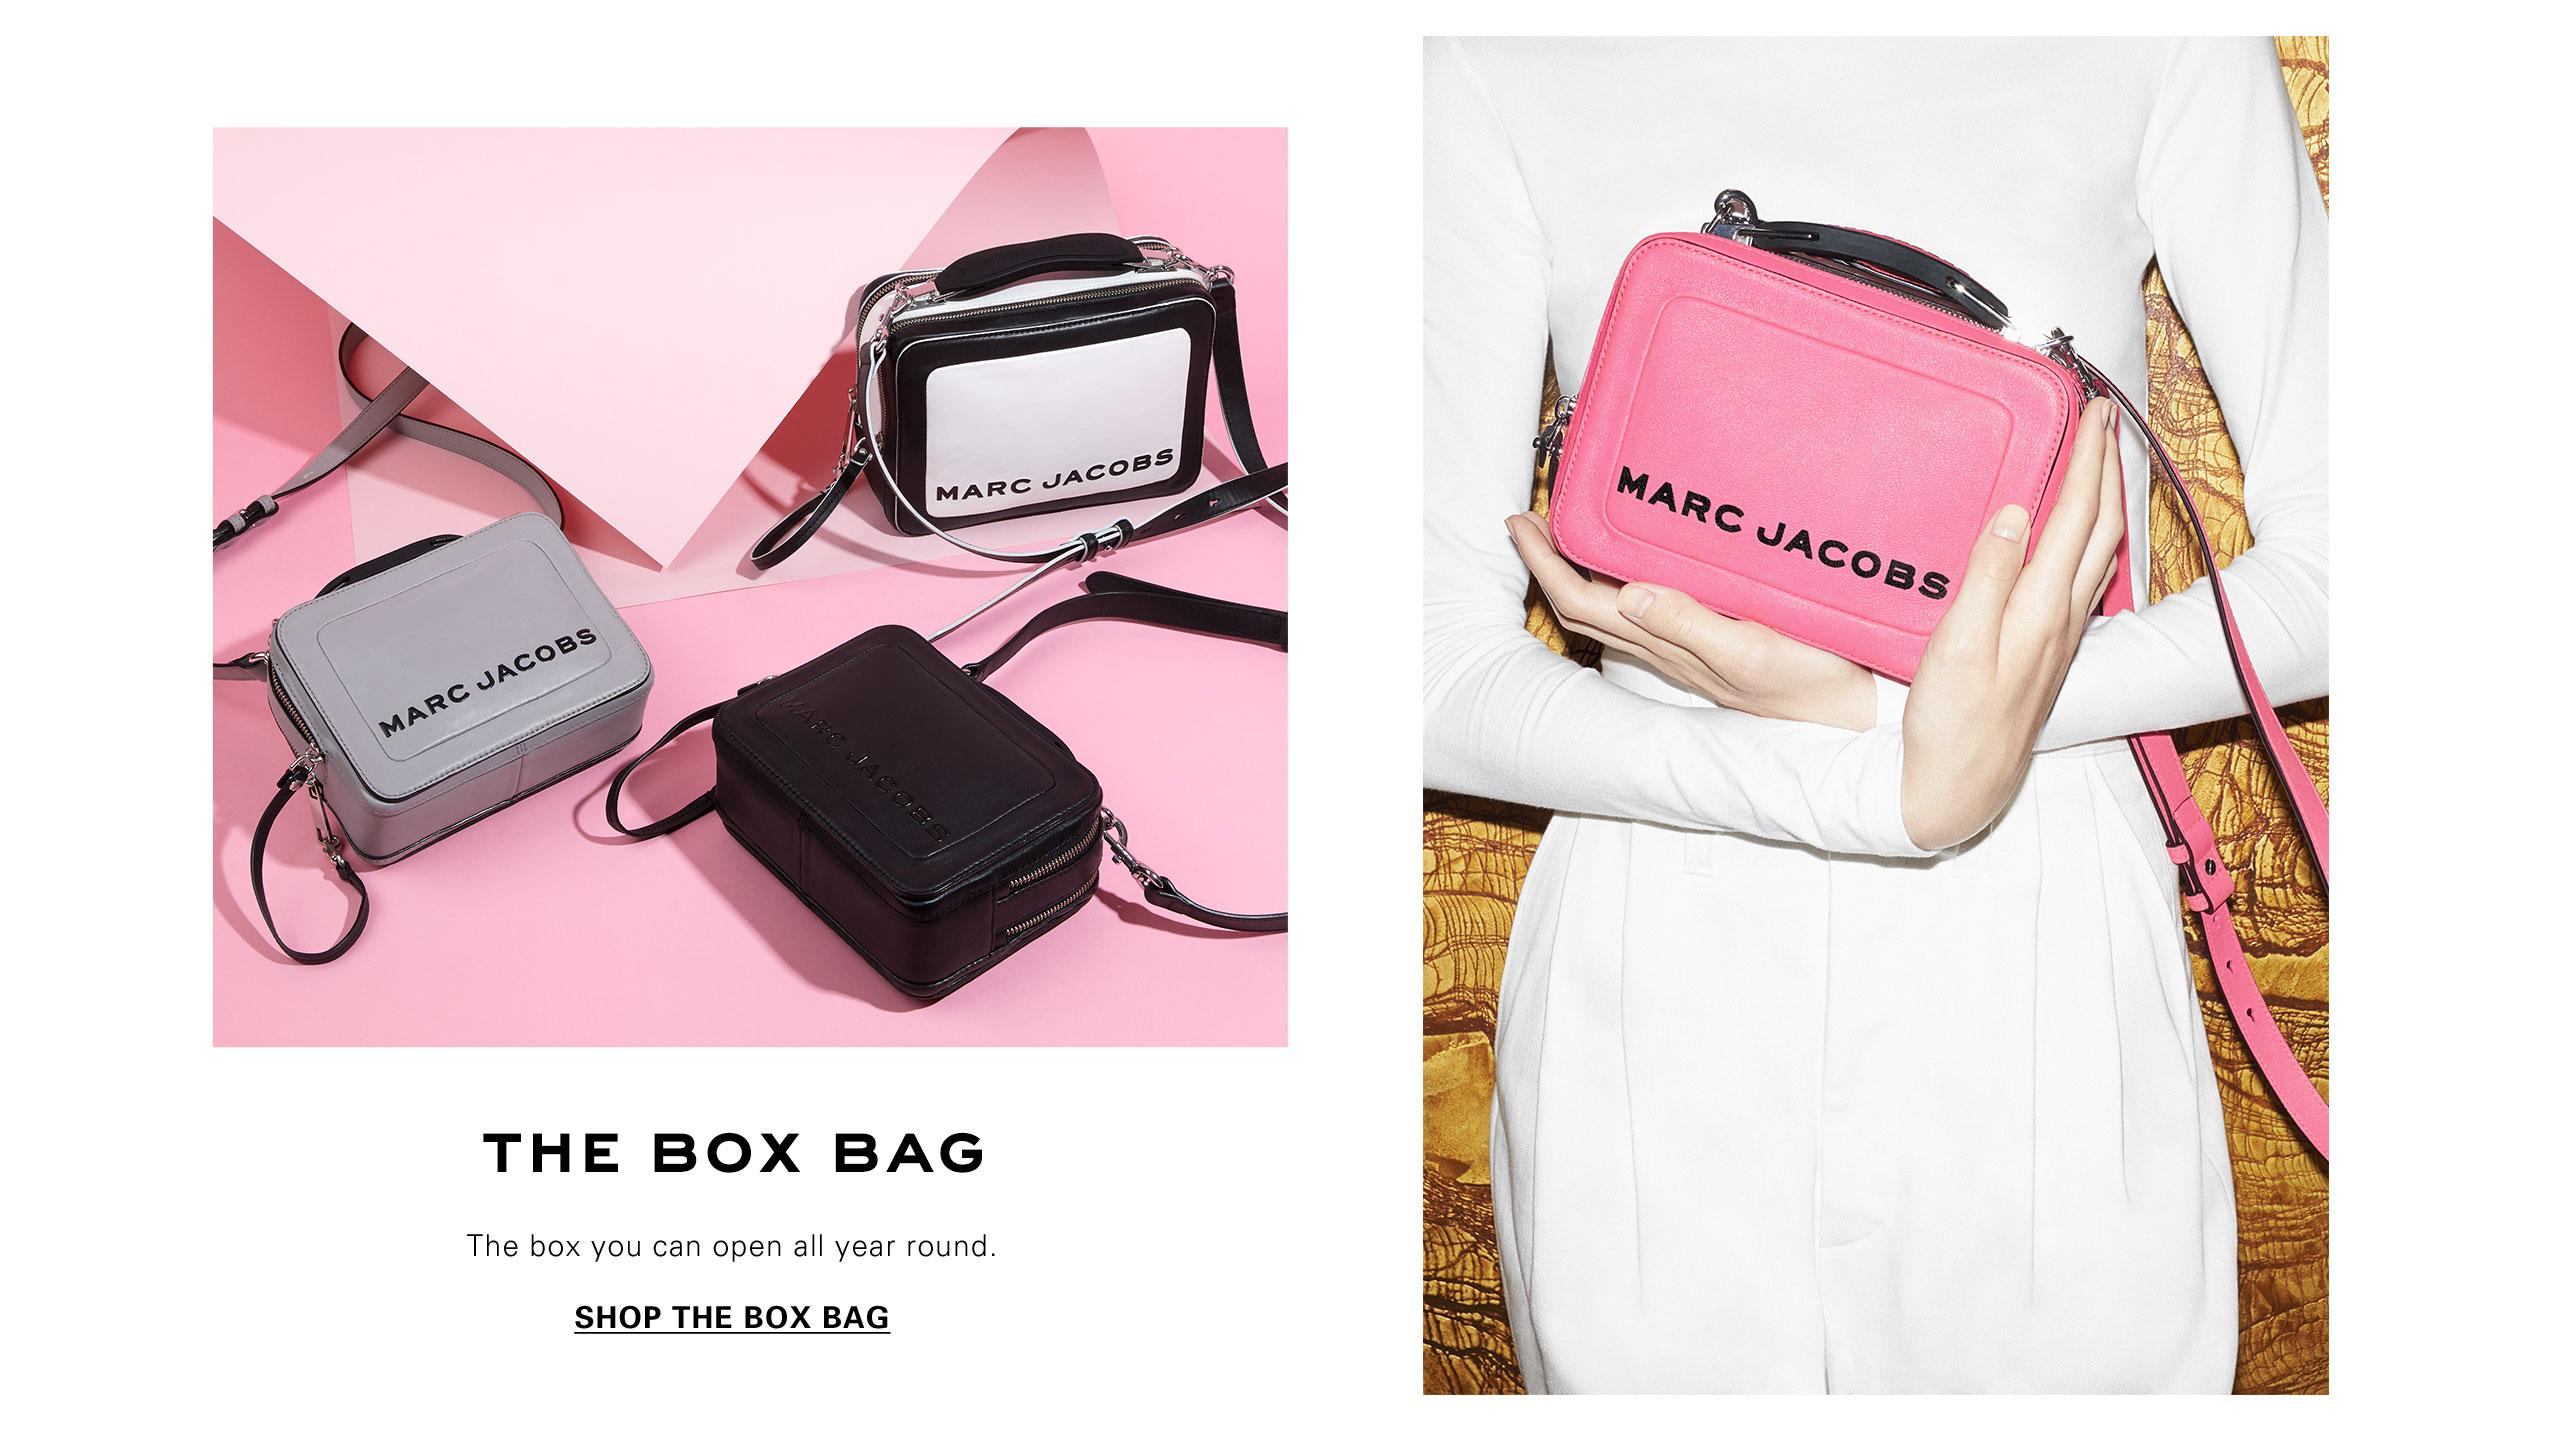 Marc Jacobs names handbag after Rihanna